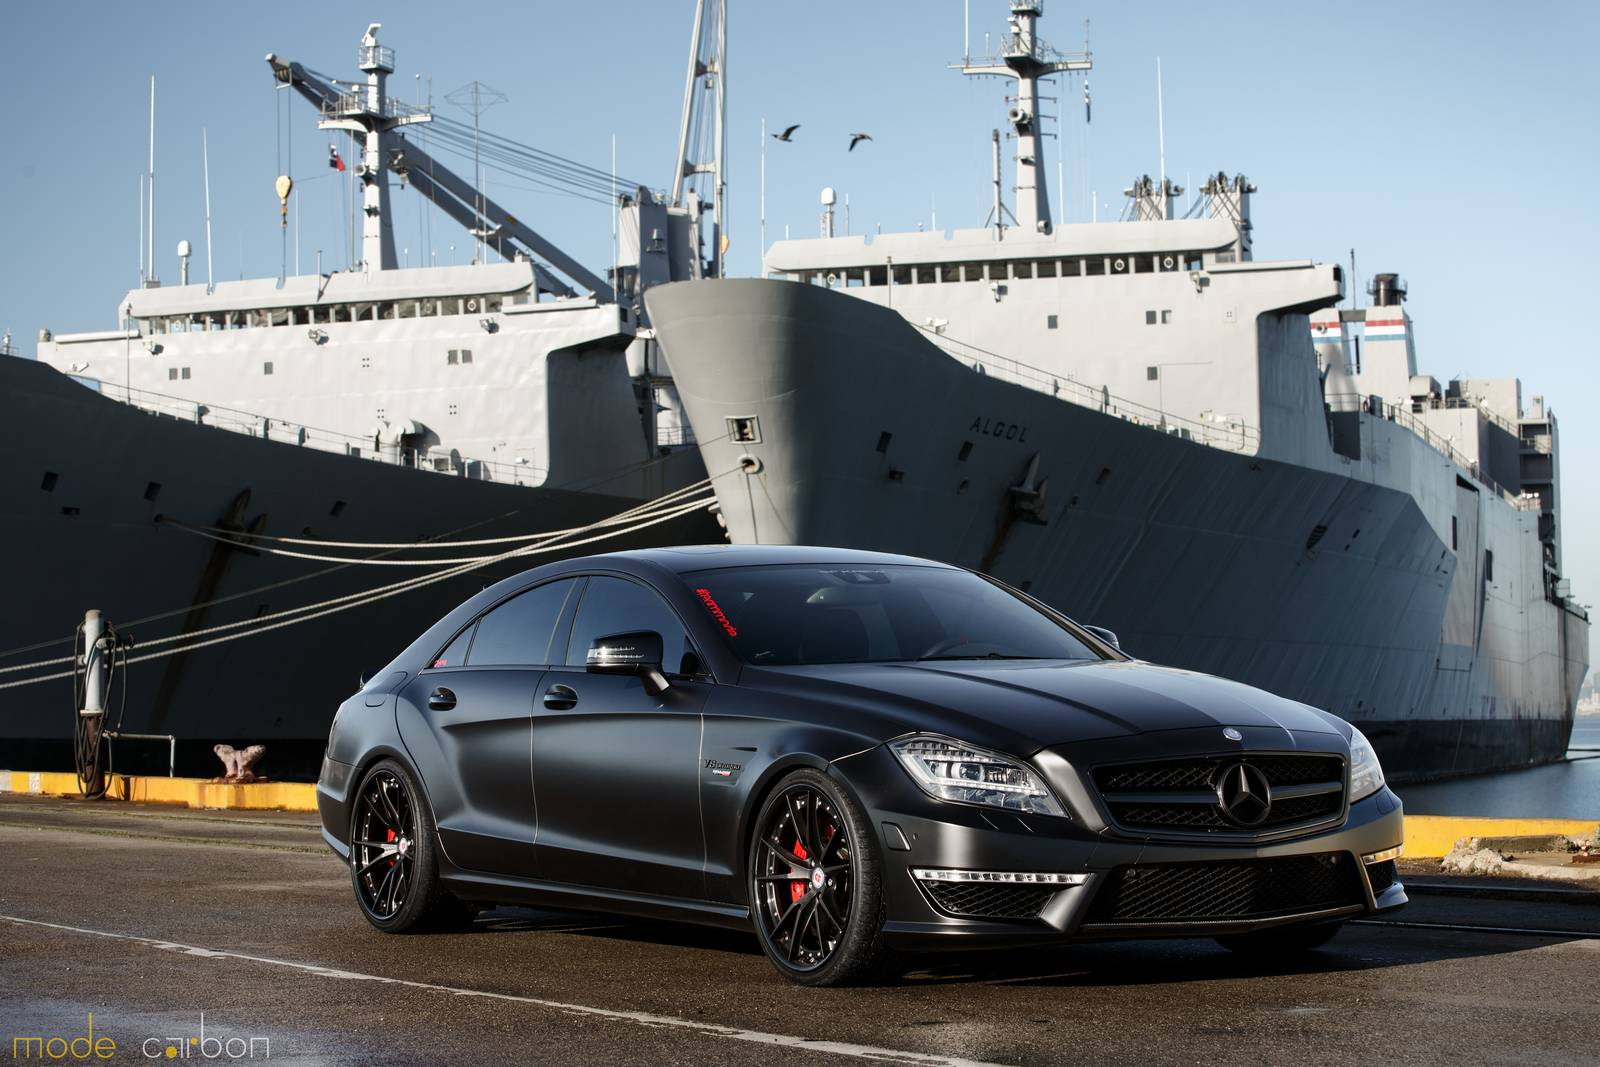 Matte Black Mercedes Benz Cls63 Amg S By Mode Carbon